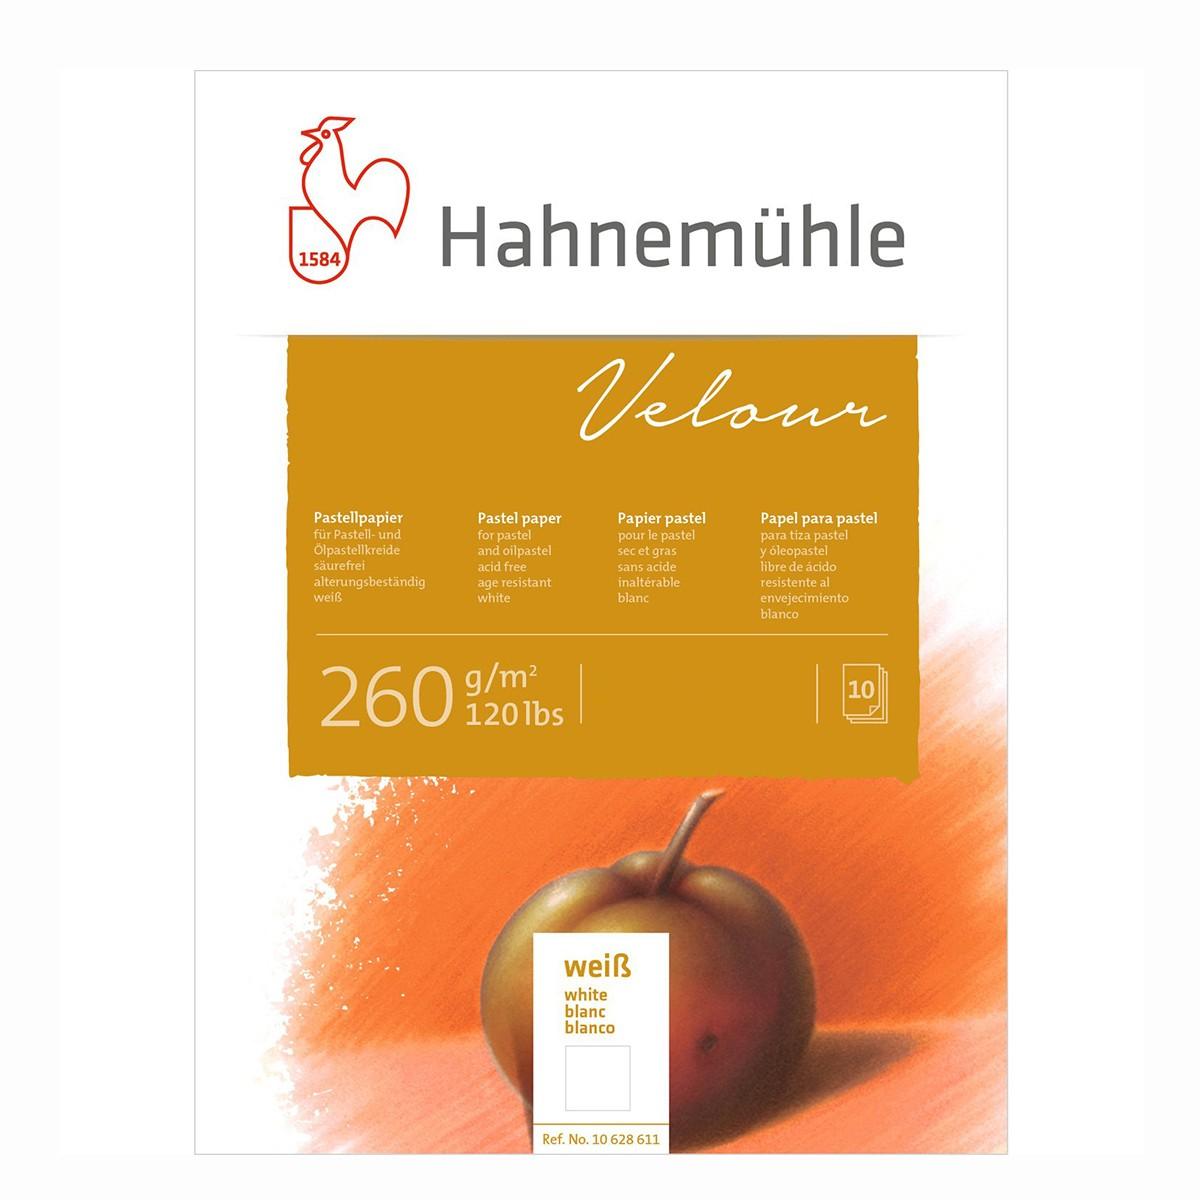 Hahnemühle Velour blok, 30x40cm. hvidt, 10 ark, 260gr.